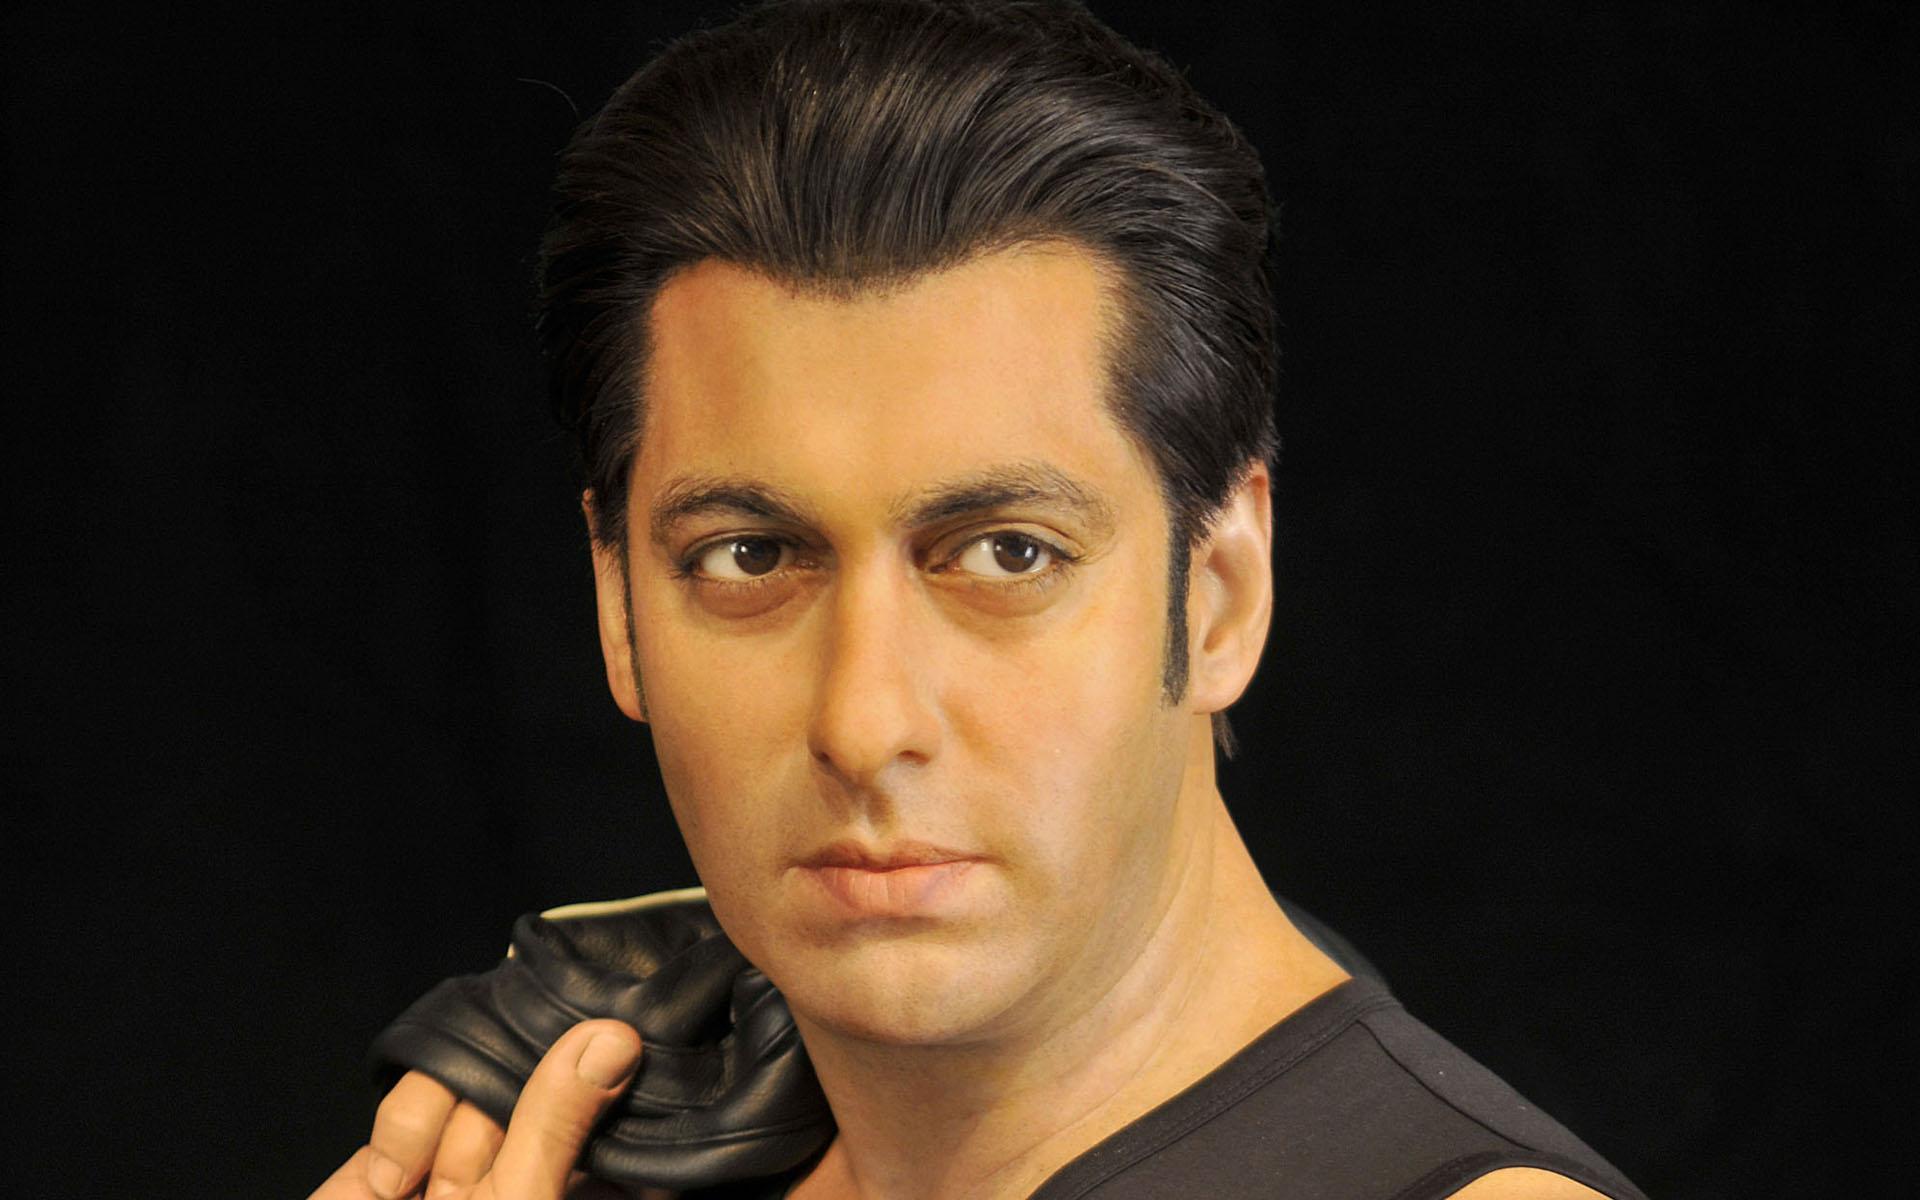 بازیگران هندی تصاوير سلمان خان هندي